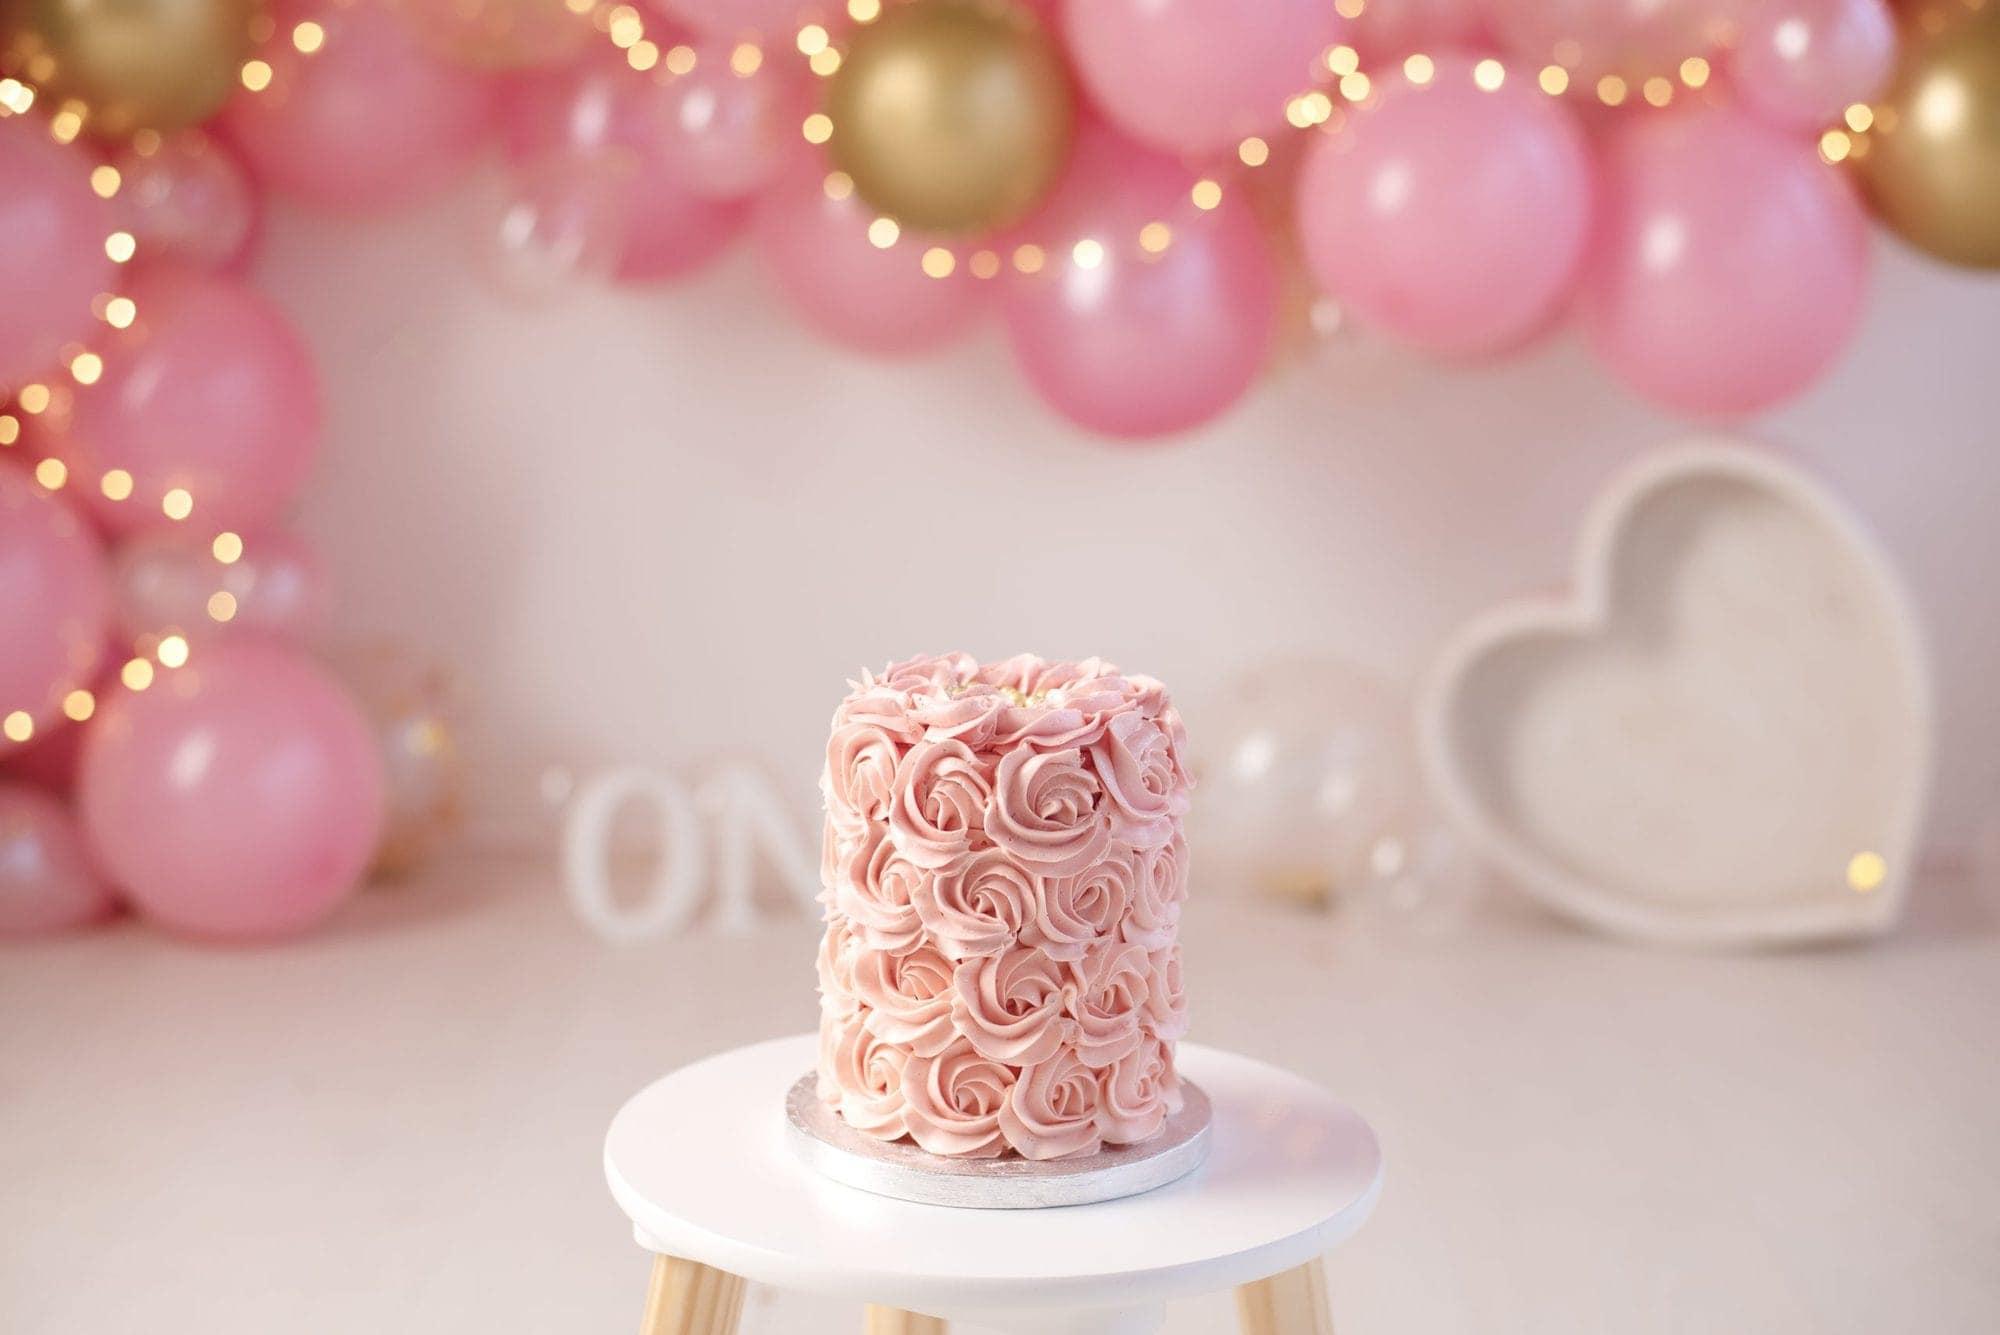 Pink, Gold, Balloon Garland, Fairy Lights, Heart Bowl, Rose Cake, Pink Cake, Cake Smash, Ashleigh Shea Photography